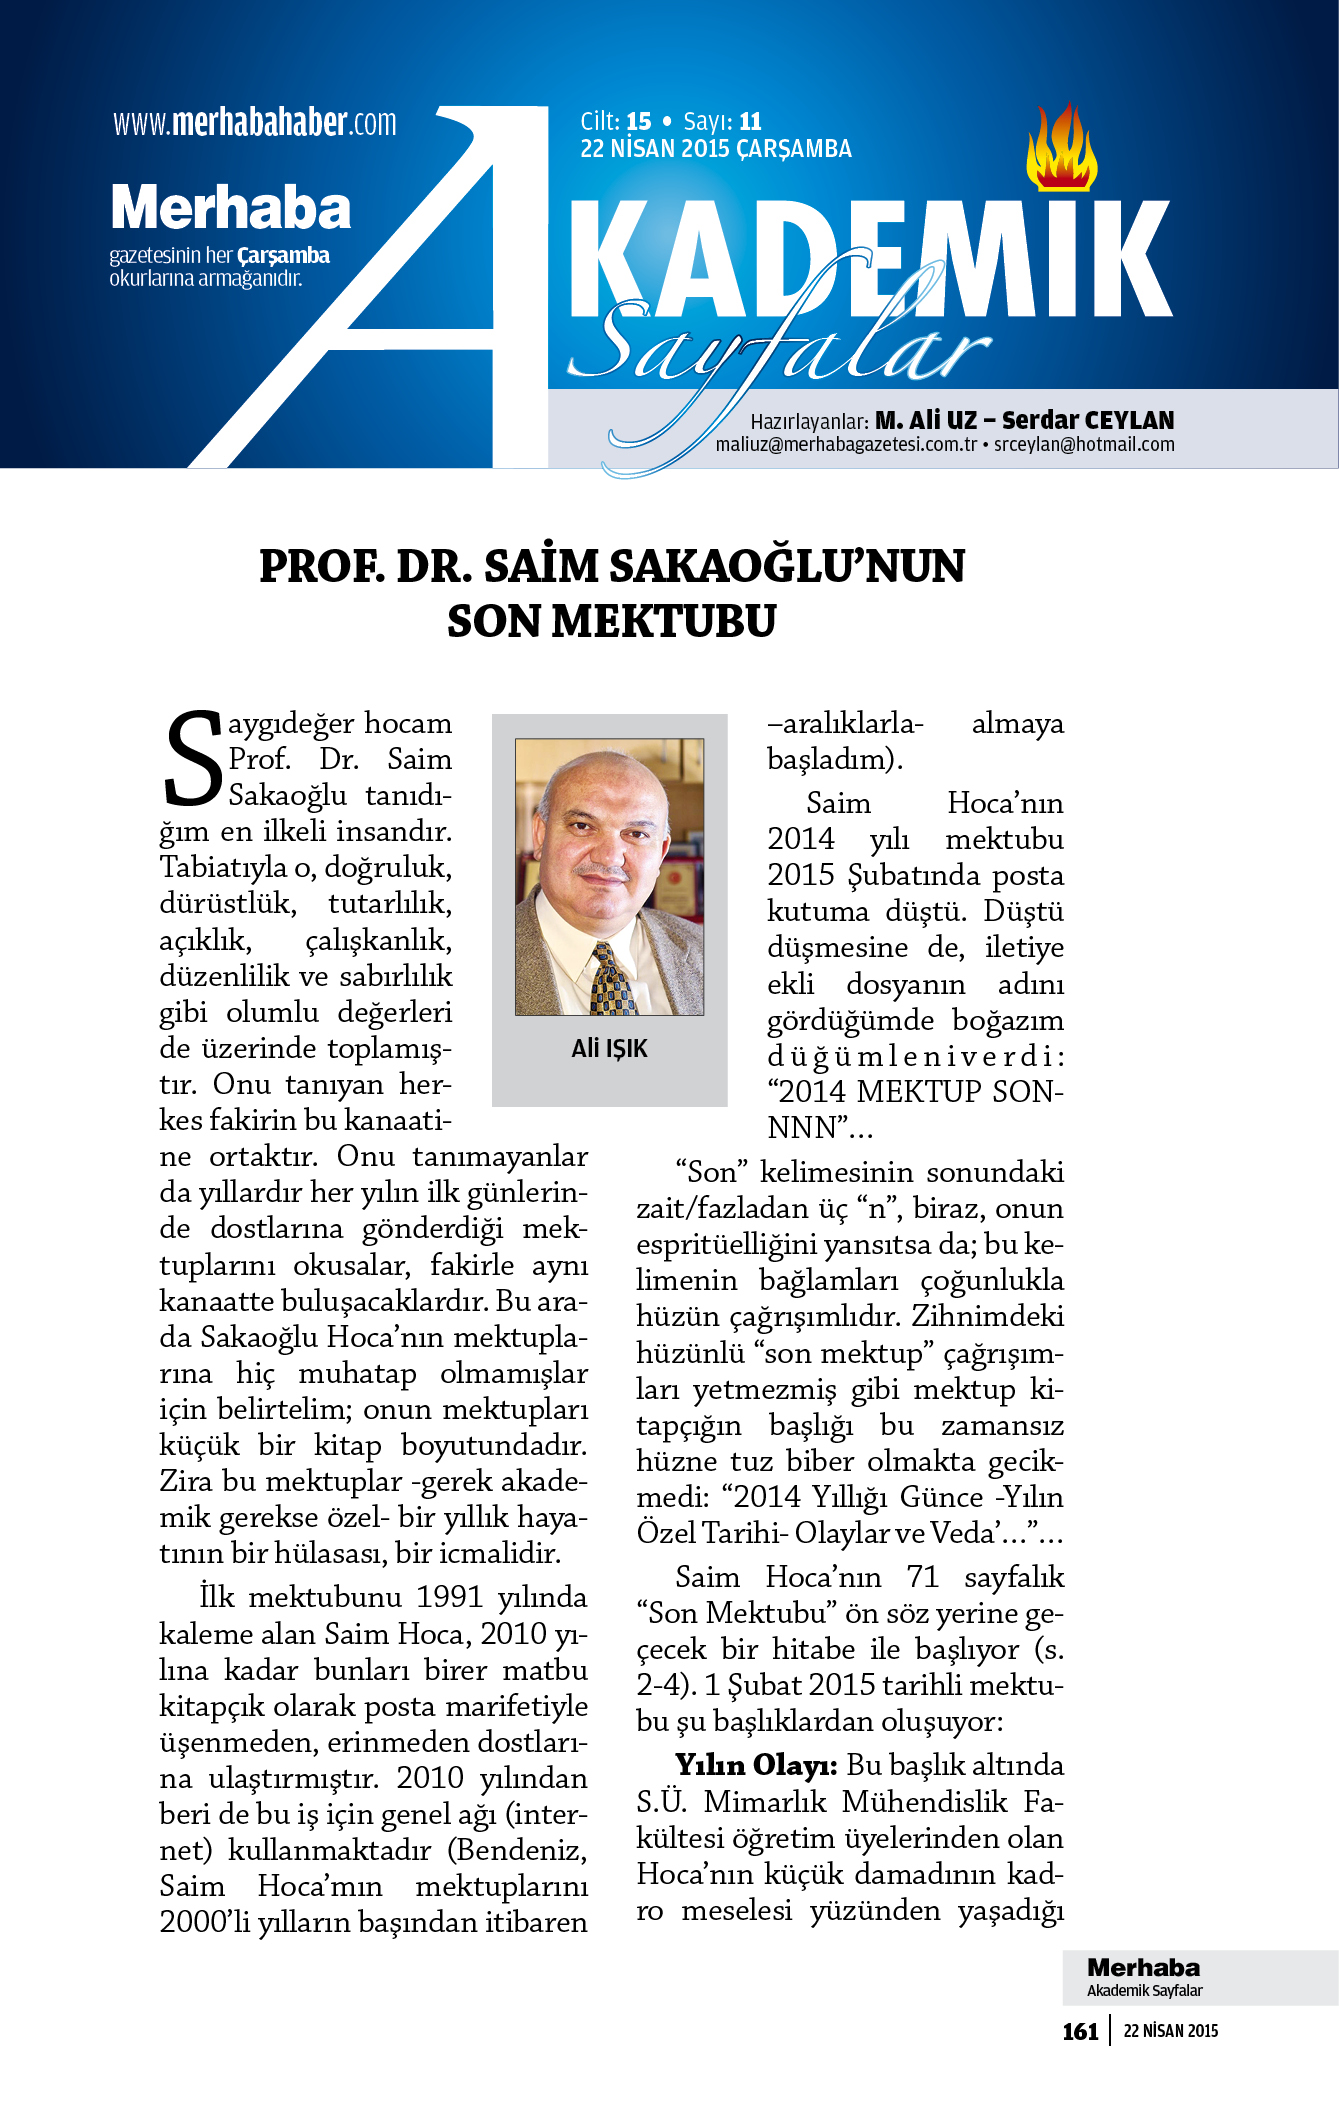 Cilt-15, Sayı-11, 22 Nisan 2015